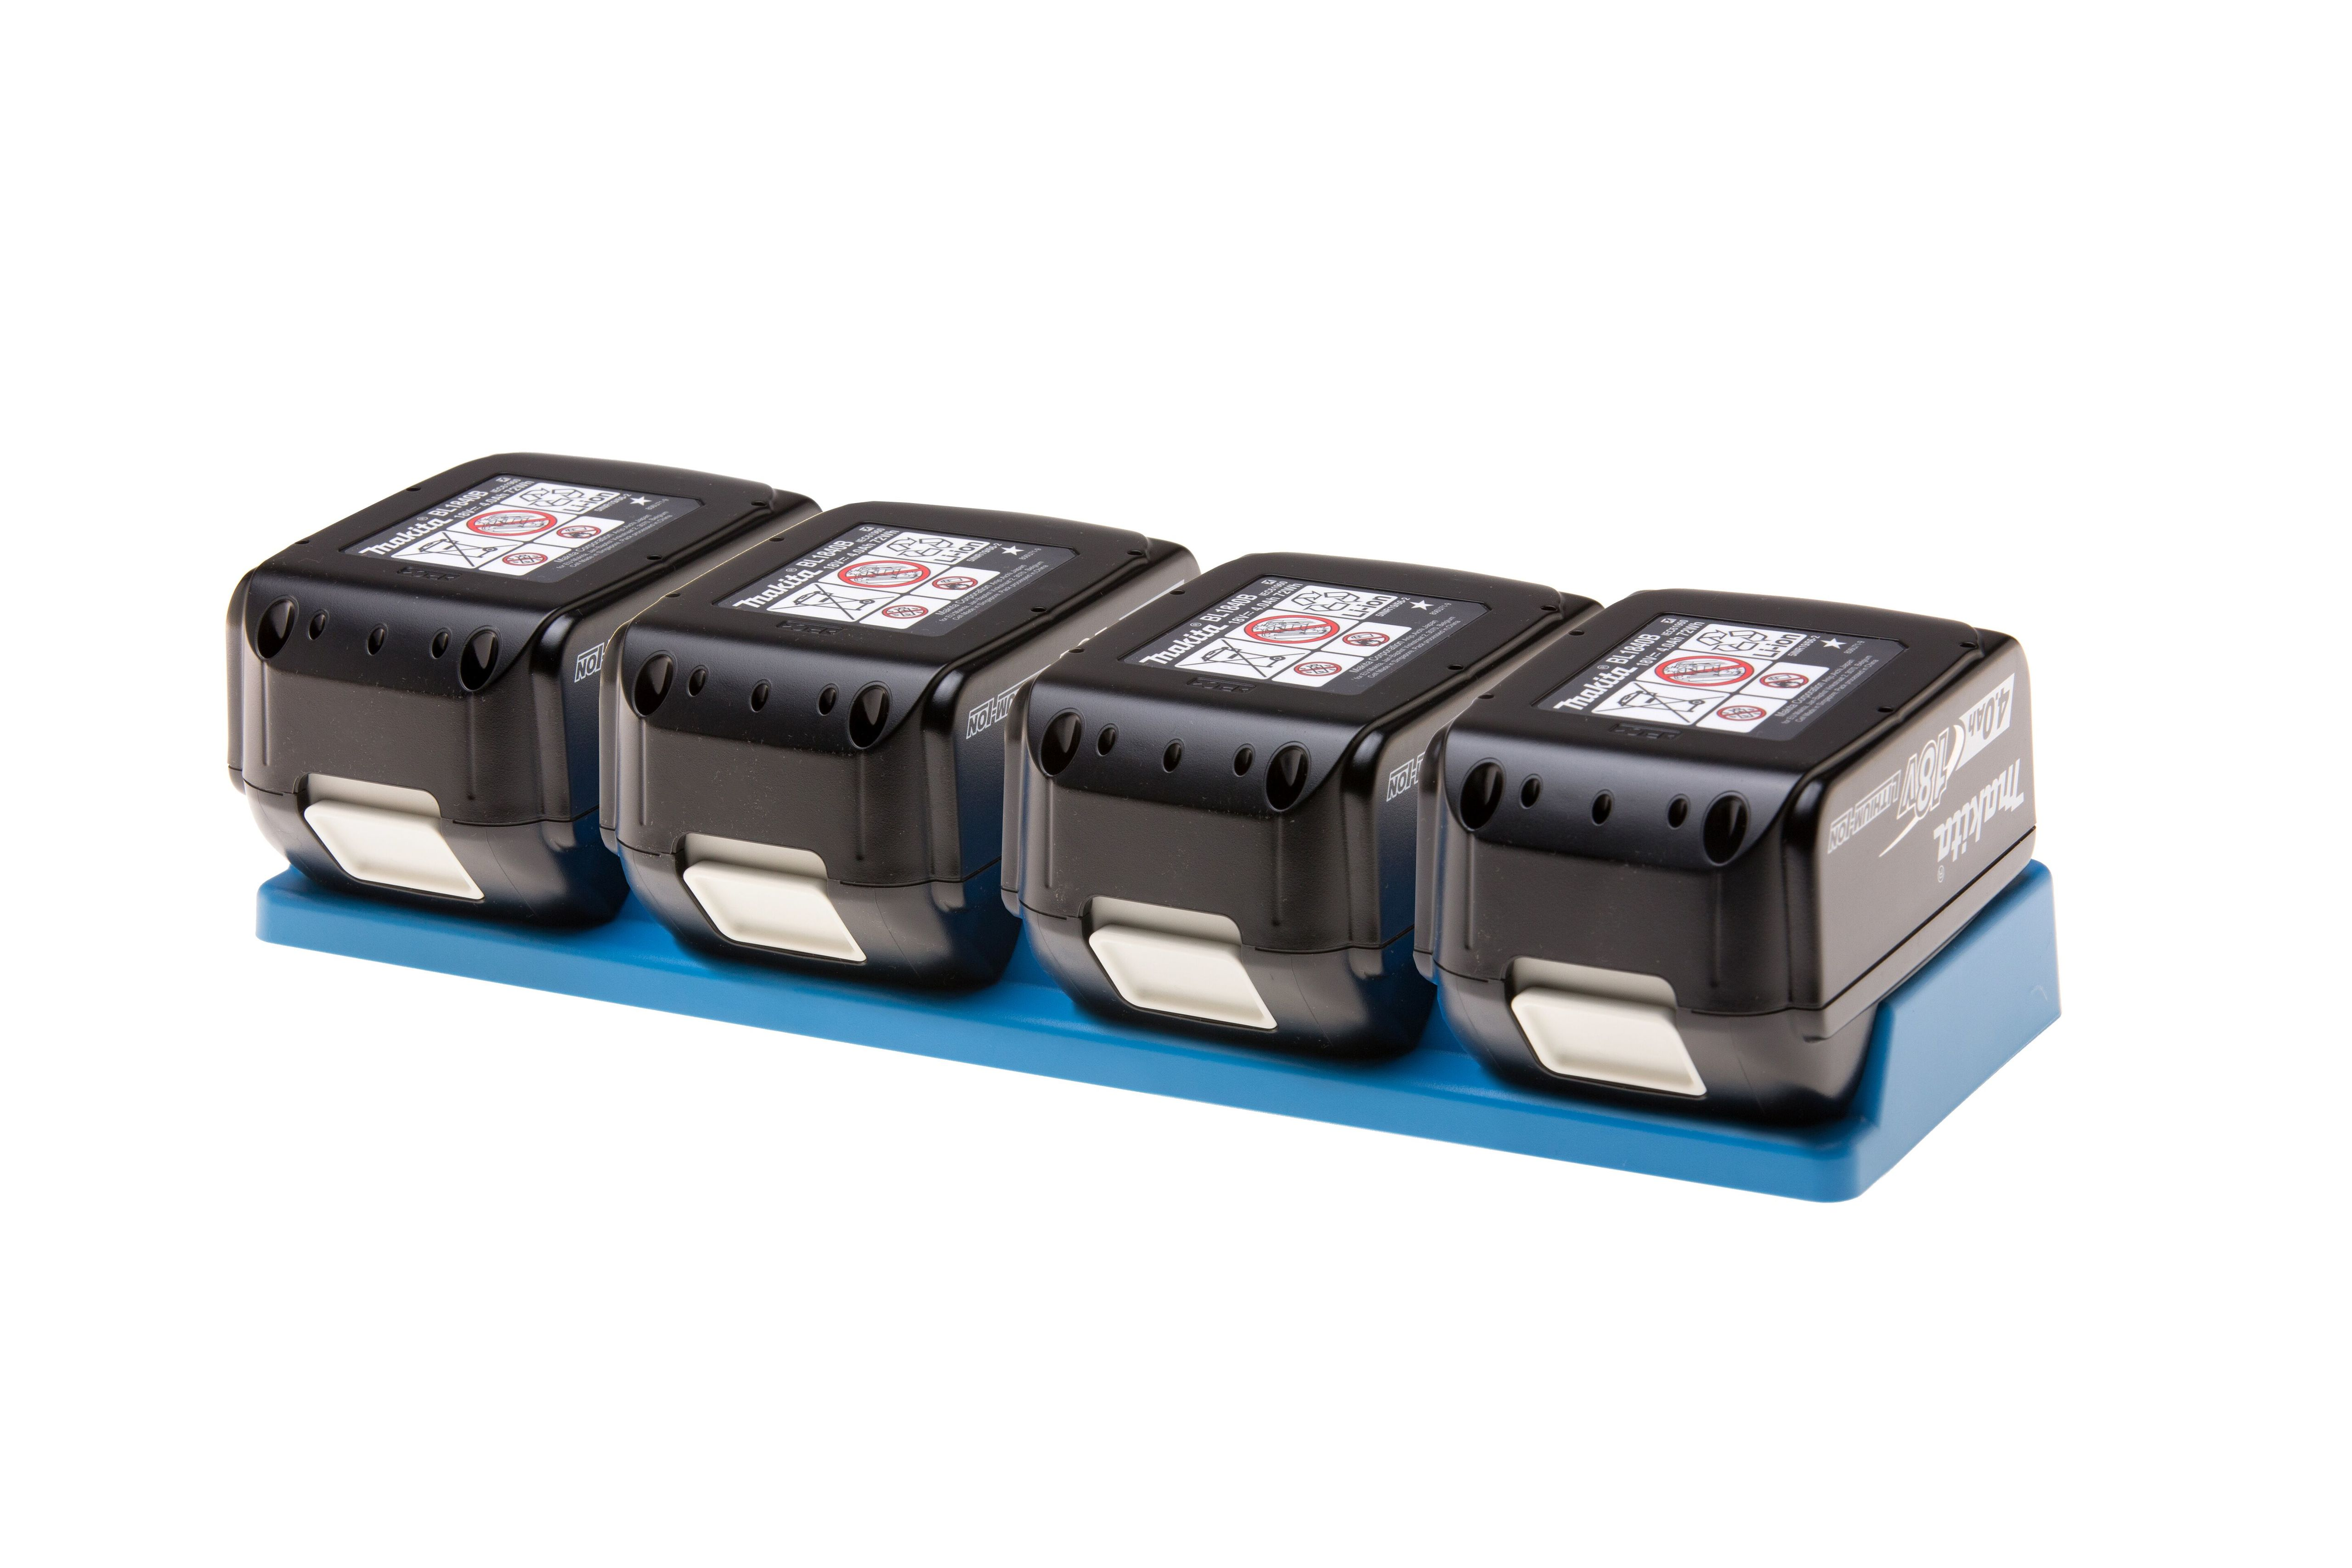 48 Tools BH-MAK-BLU-04 Makita 18V 4-Unit Battery Holder